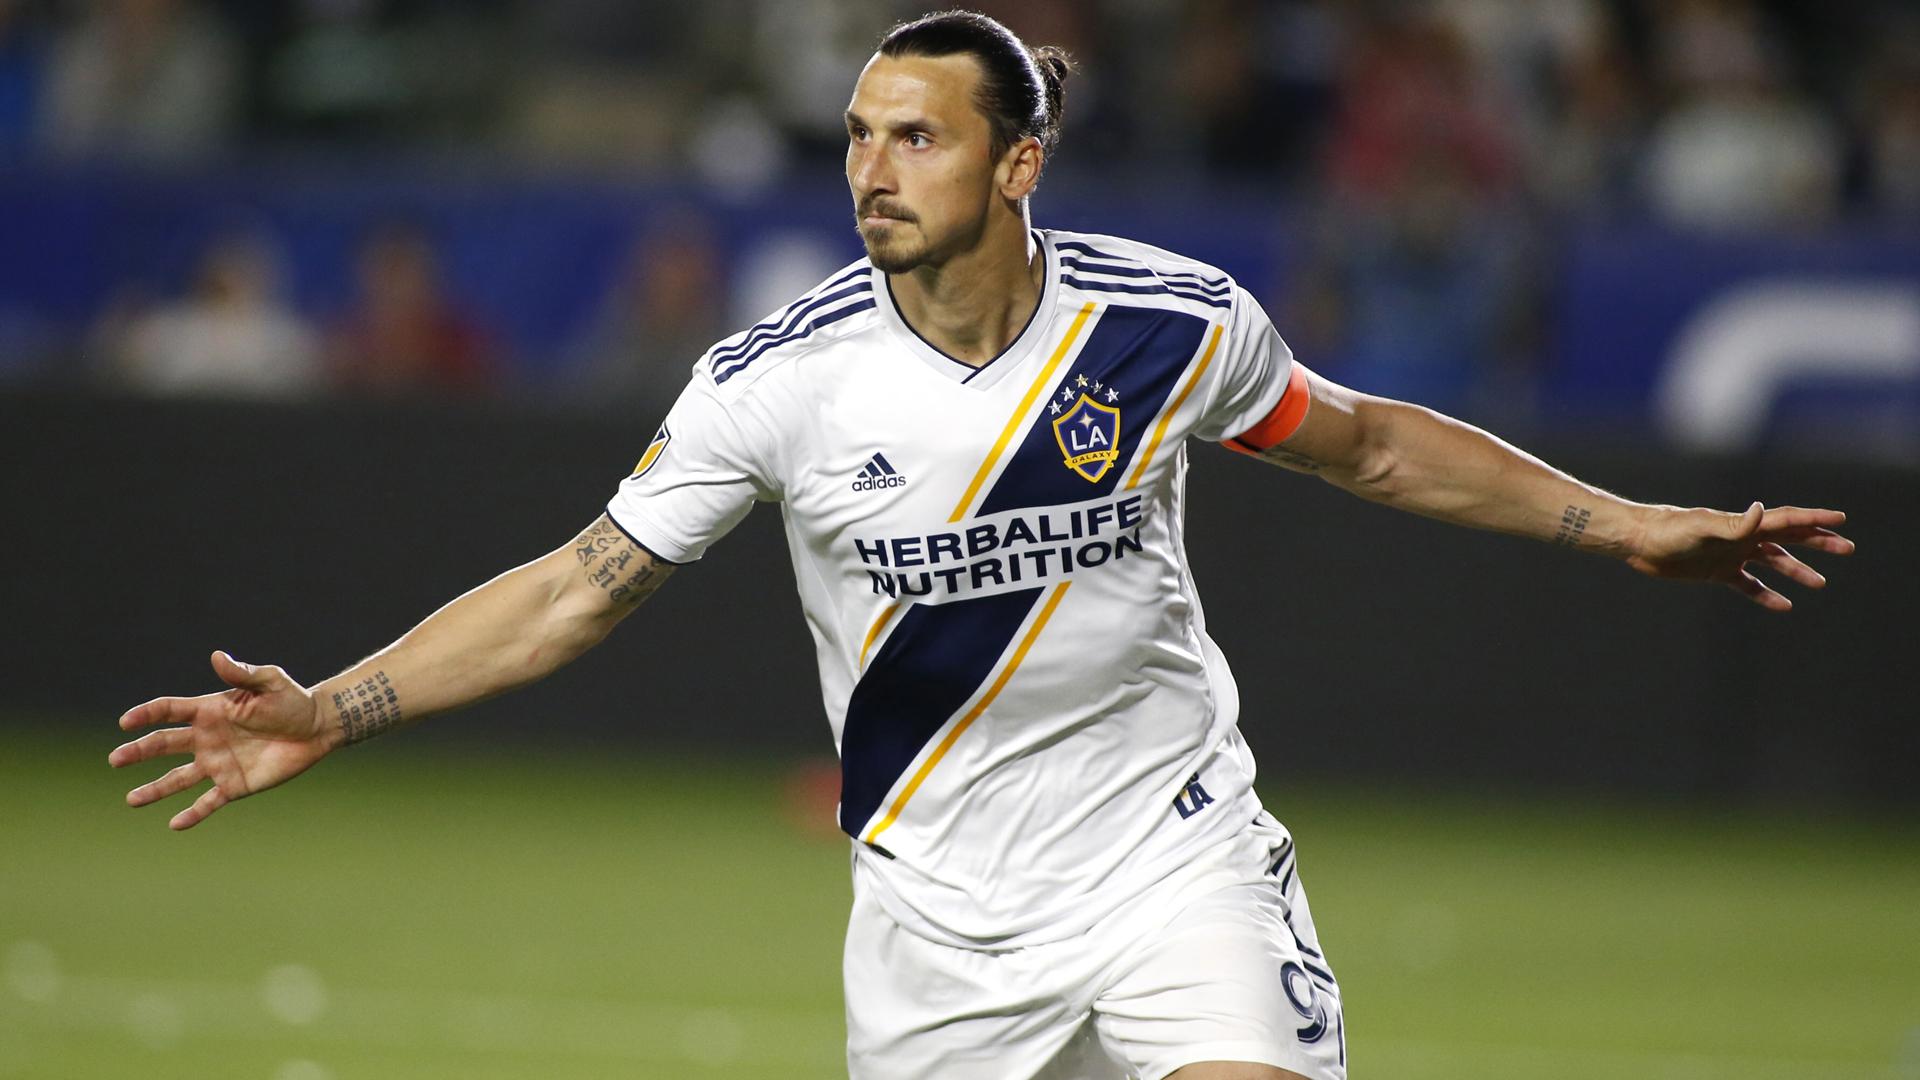 Zlatan Ibrahimovic's 2019 salary sets MLS record